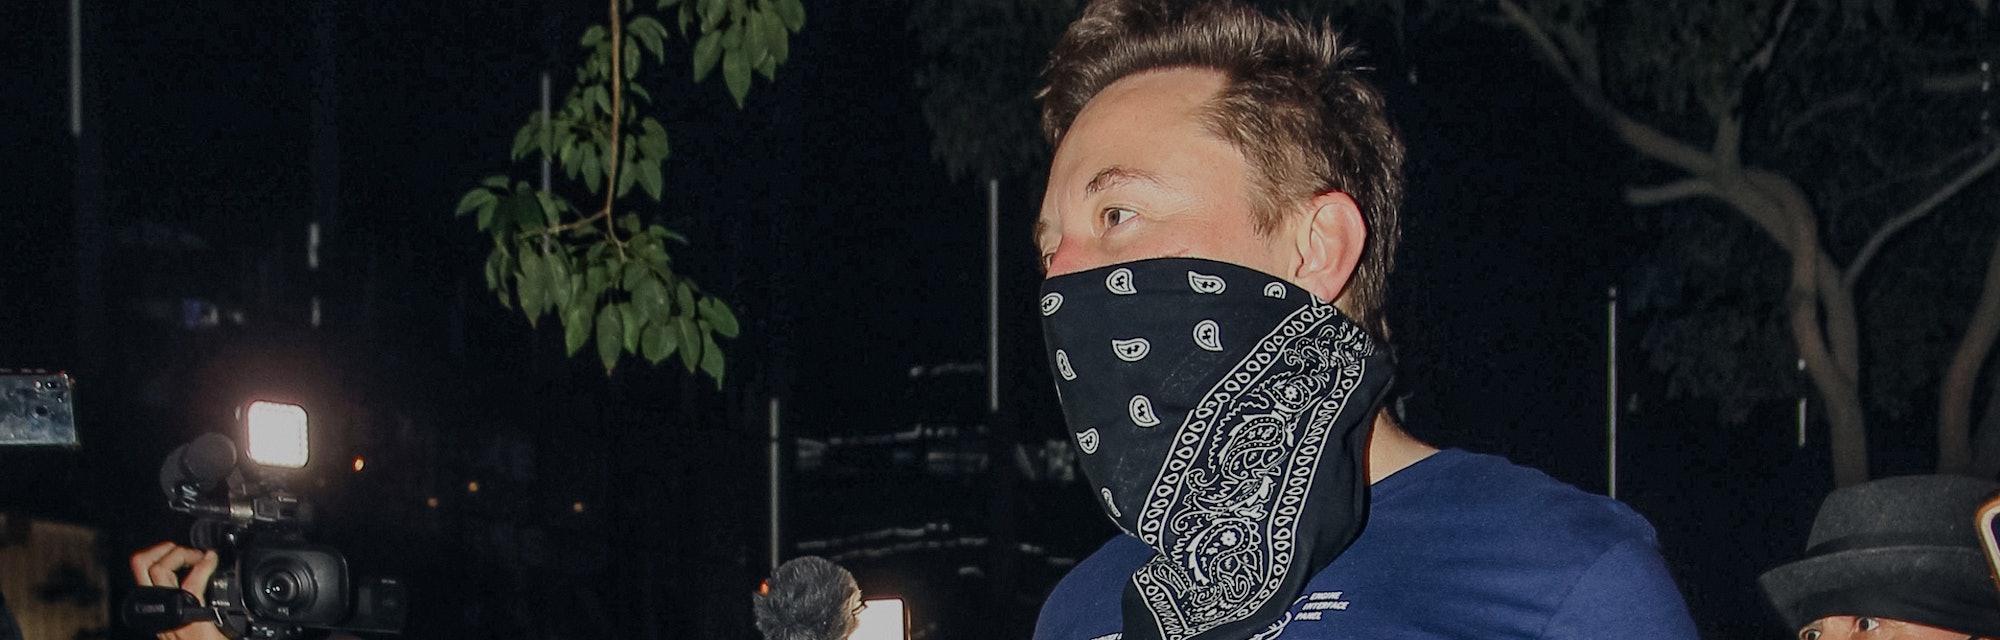 LOS ANGELES, CA - OCTOBER 23: Elon Musk is seen on October 23, 2020 in Los Angeles, California.  (Ph...